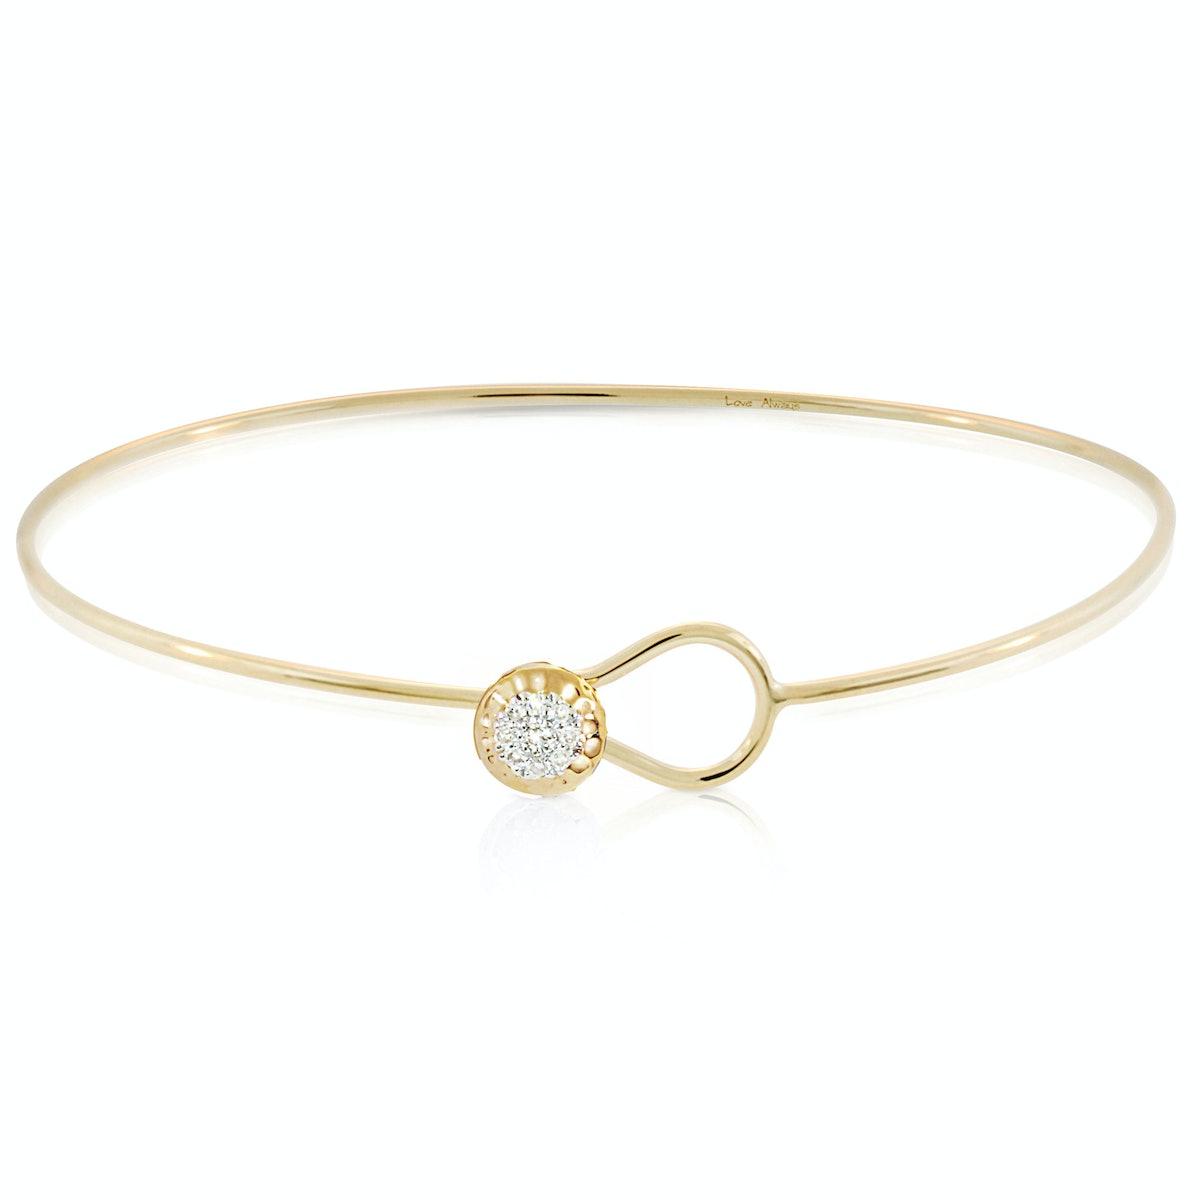 __For the romantic:__ Phillips House YG Diamond Wire Love Always Bracelet, $950, saksfifthavenue.com...